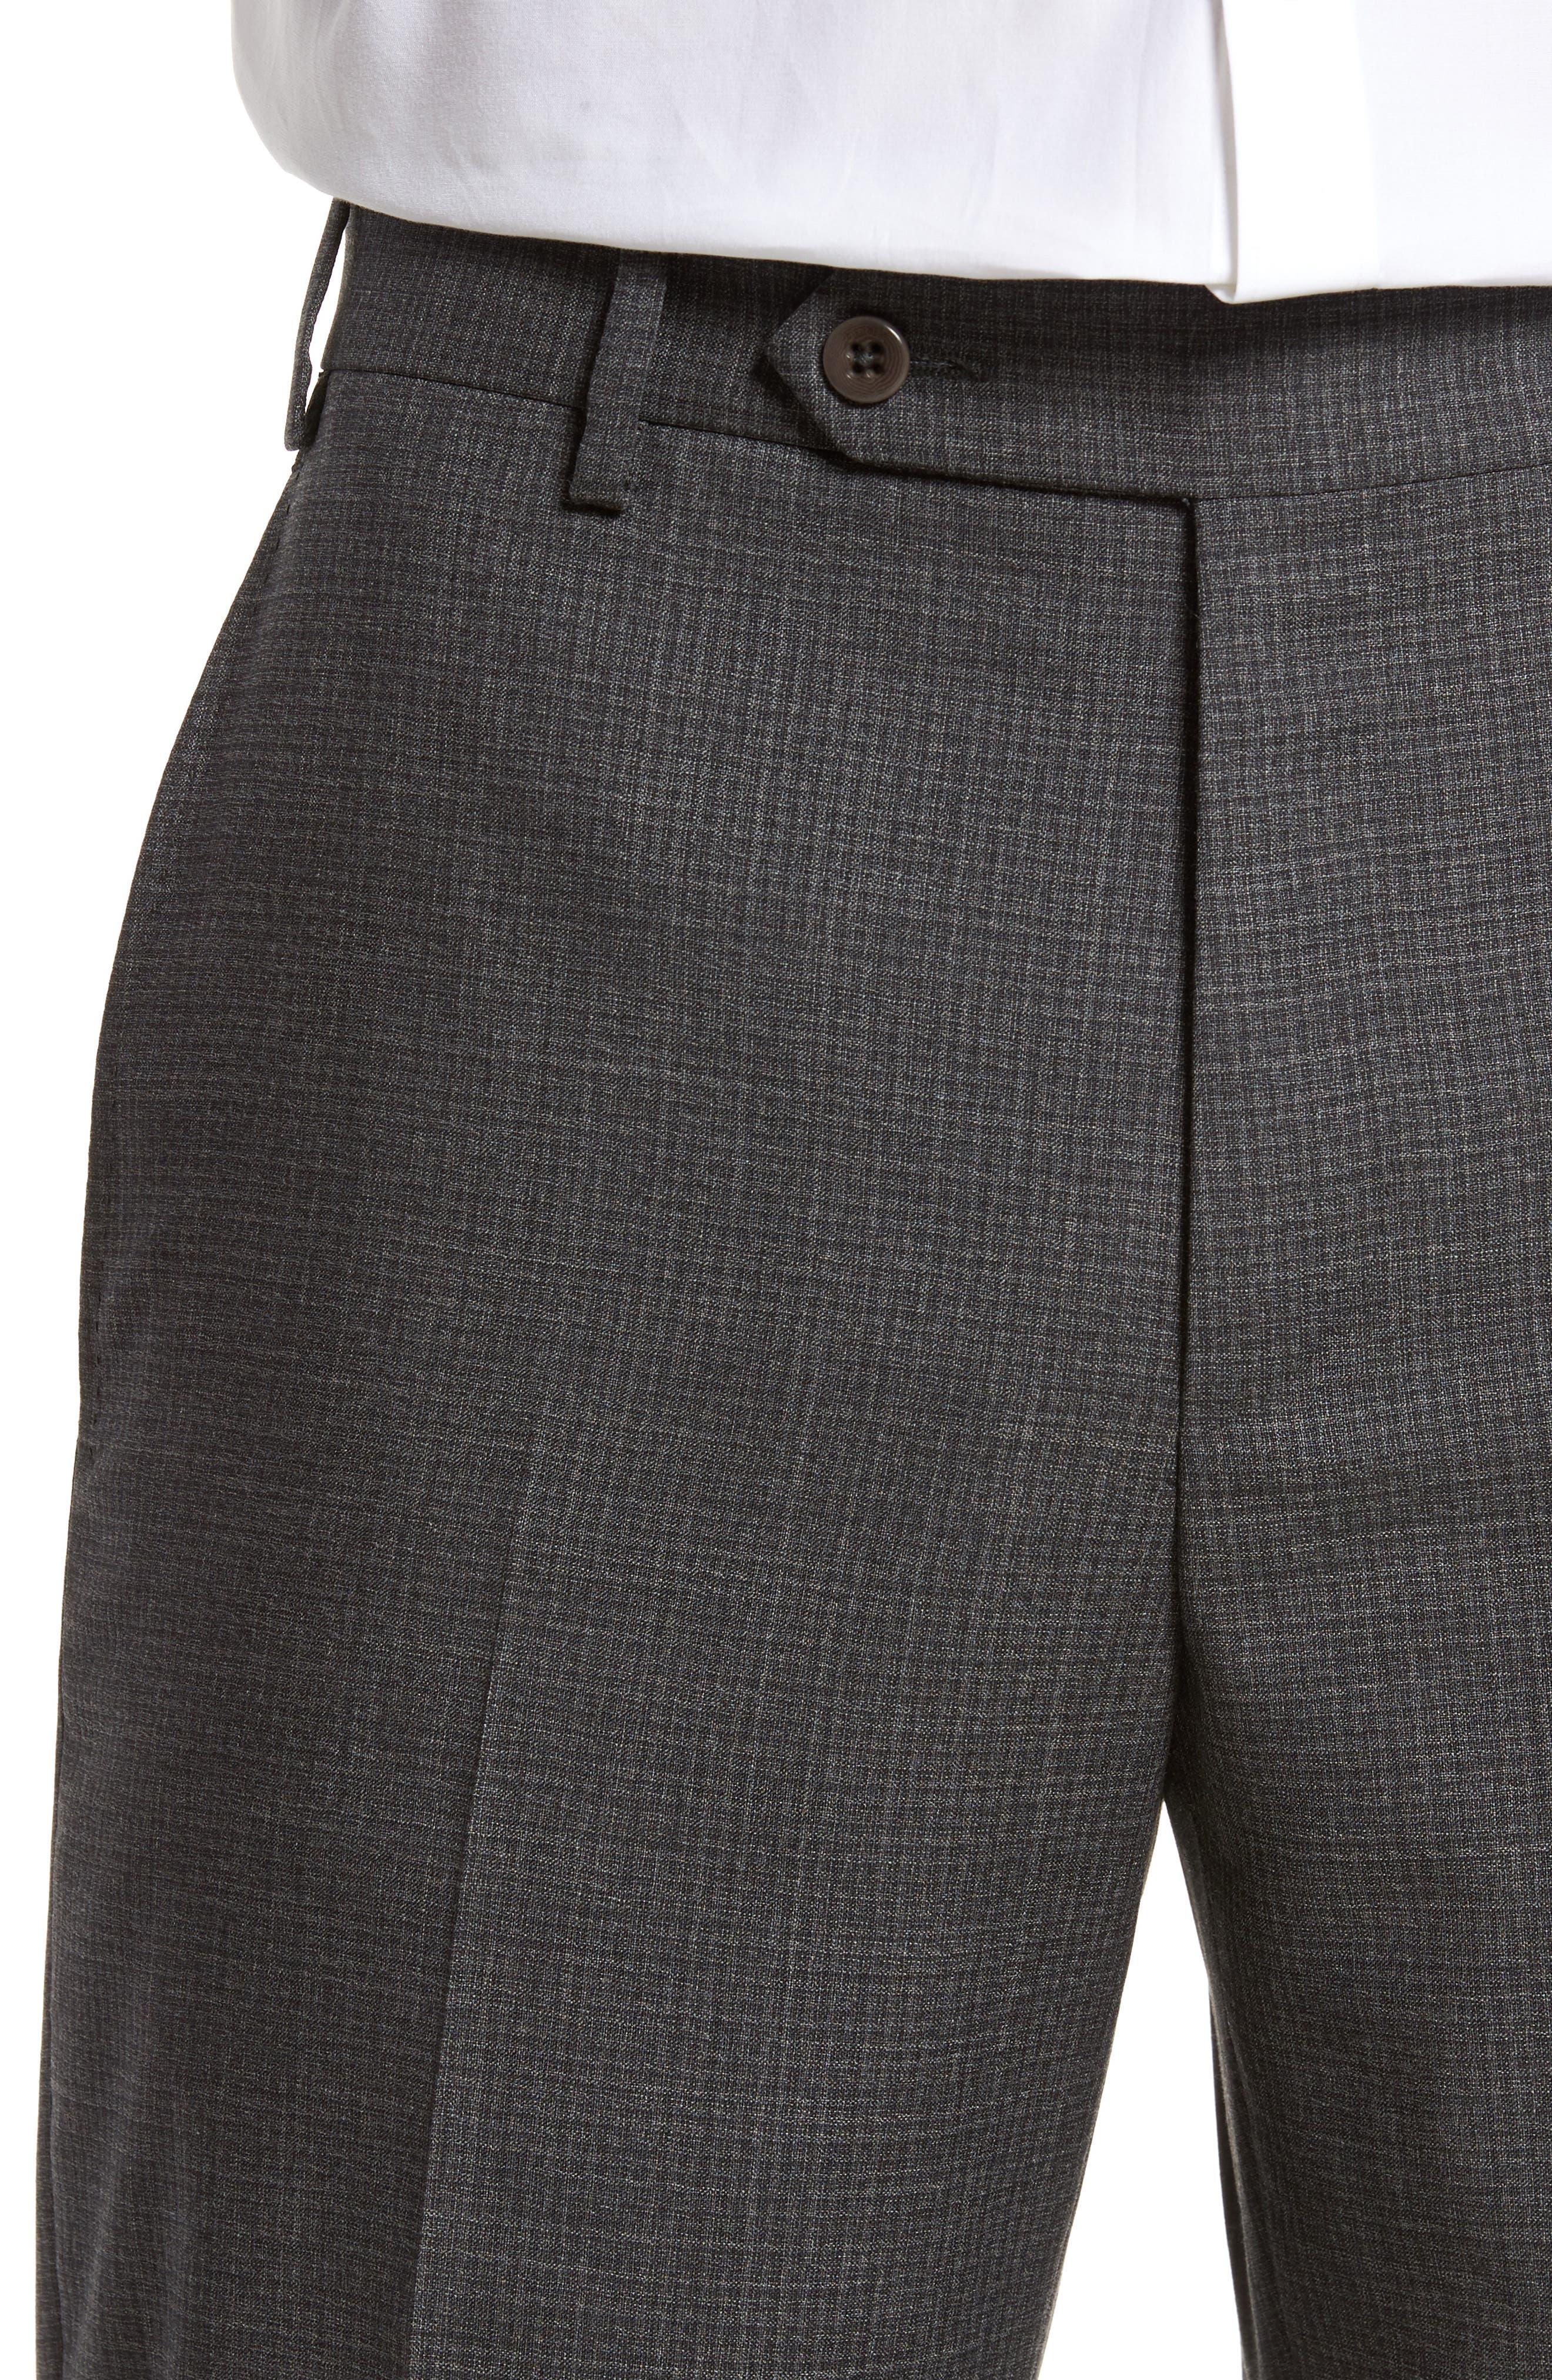 Devon Flat Front Check Wool Trousers,                             Alternate thumbnail 5, color,                             020